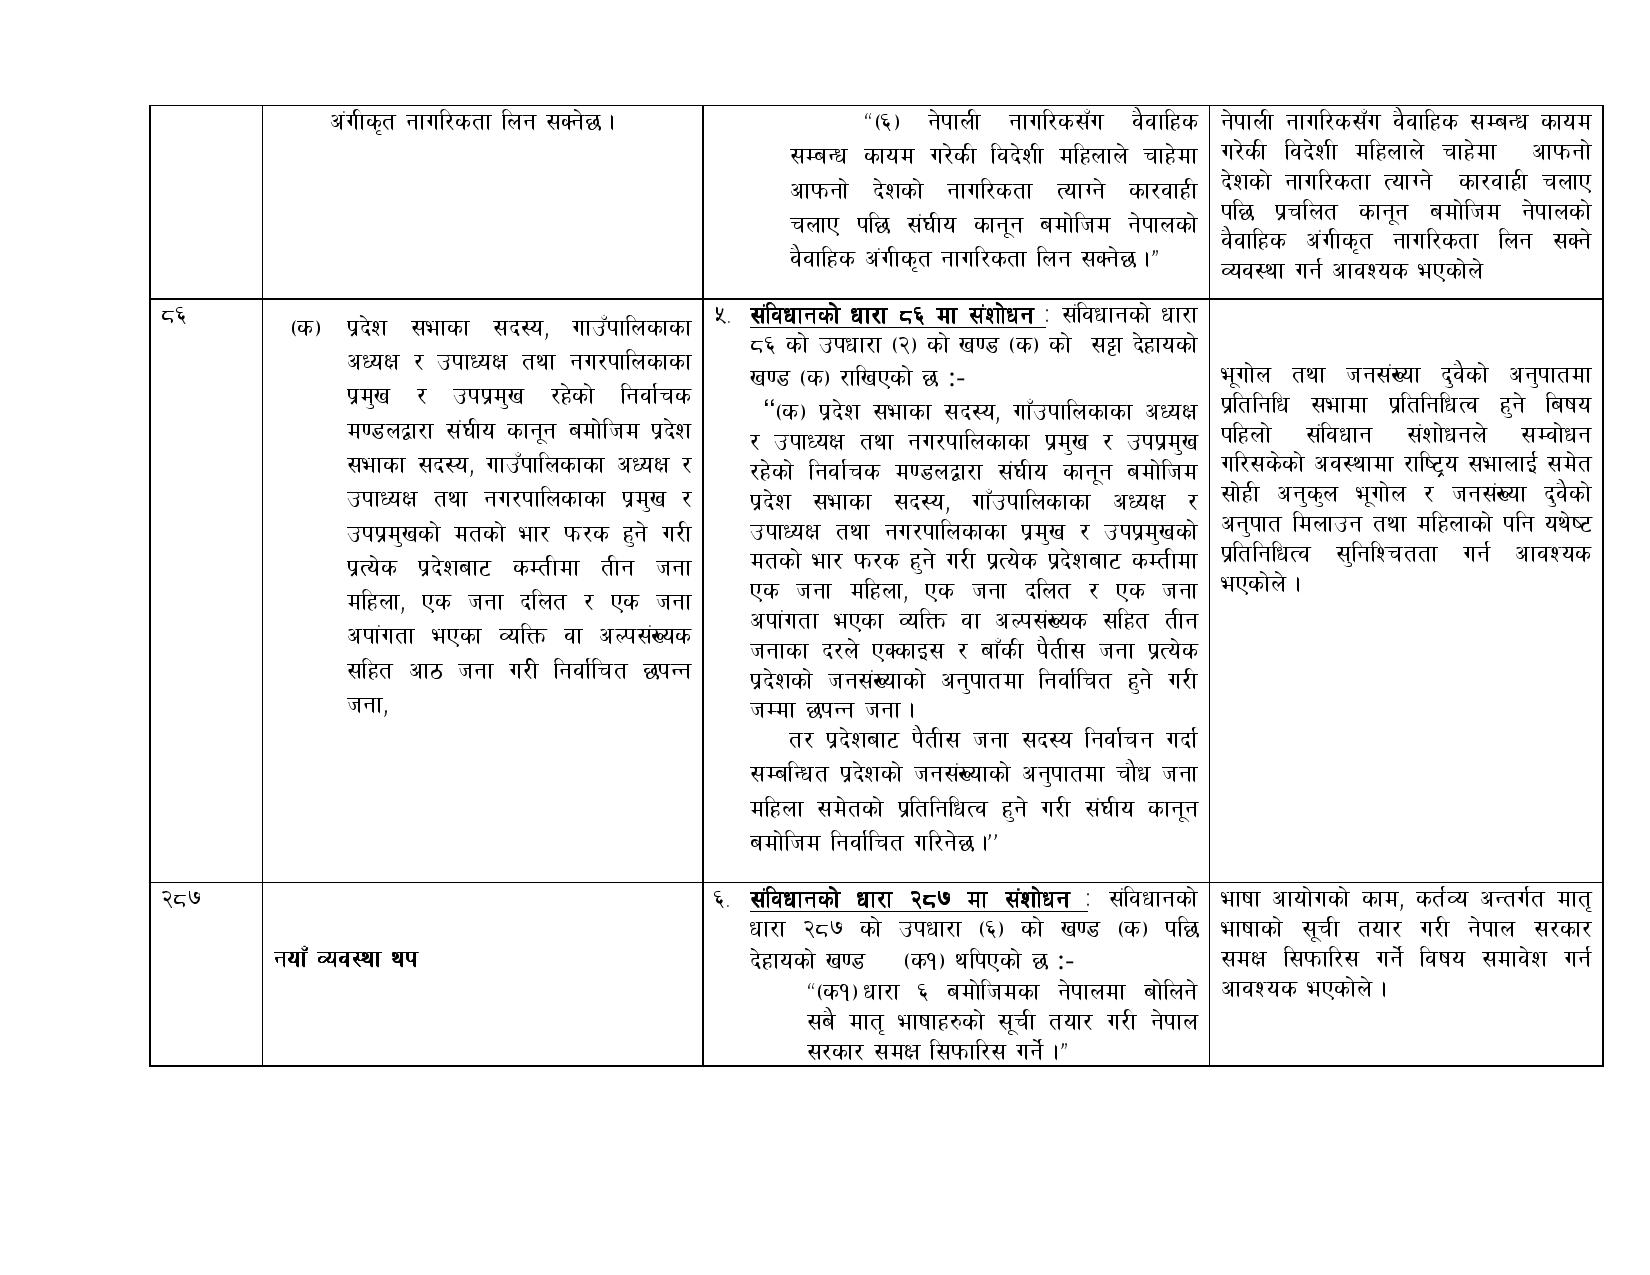 amendment-final-page-004